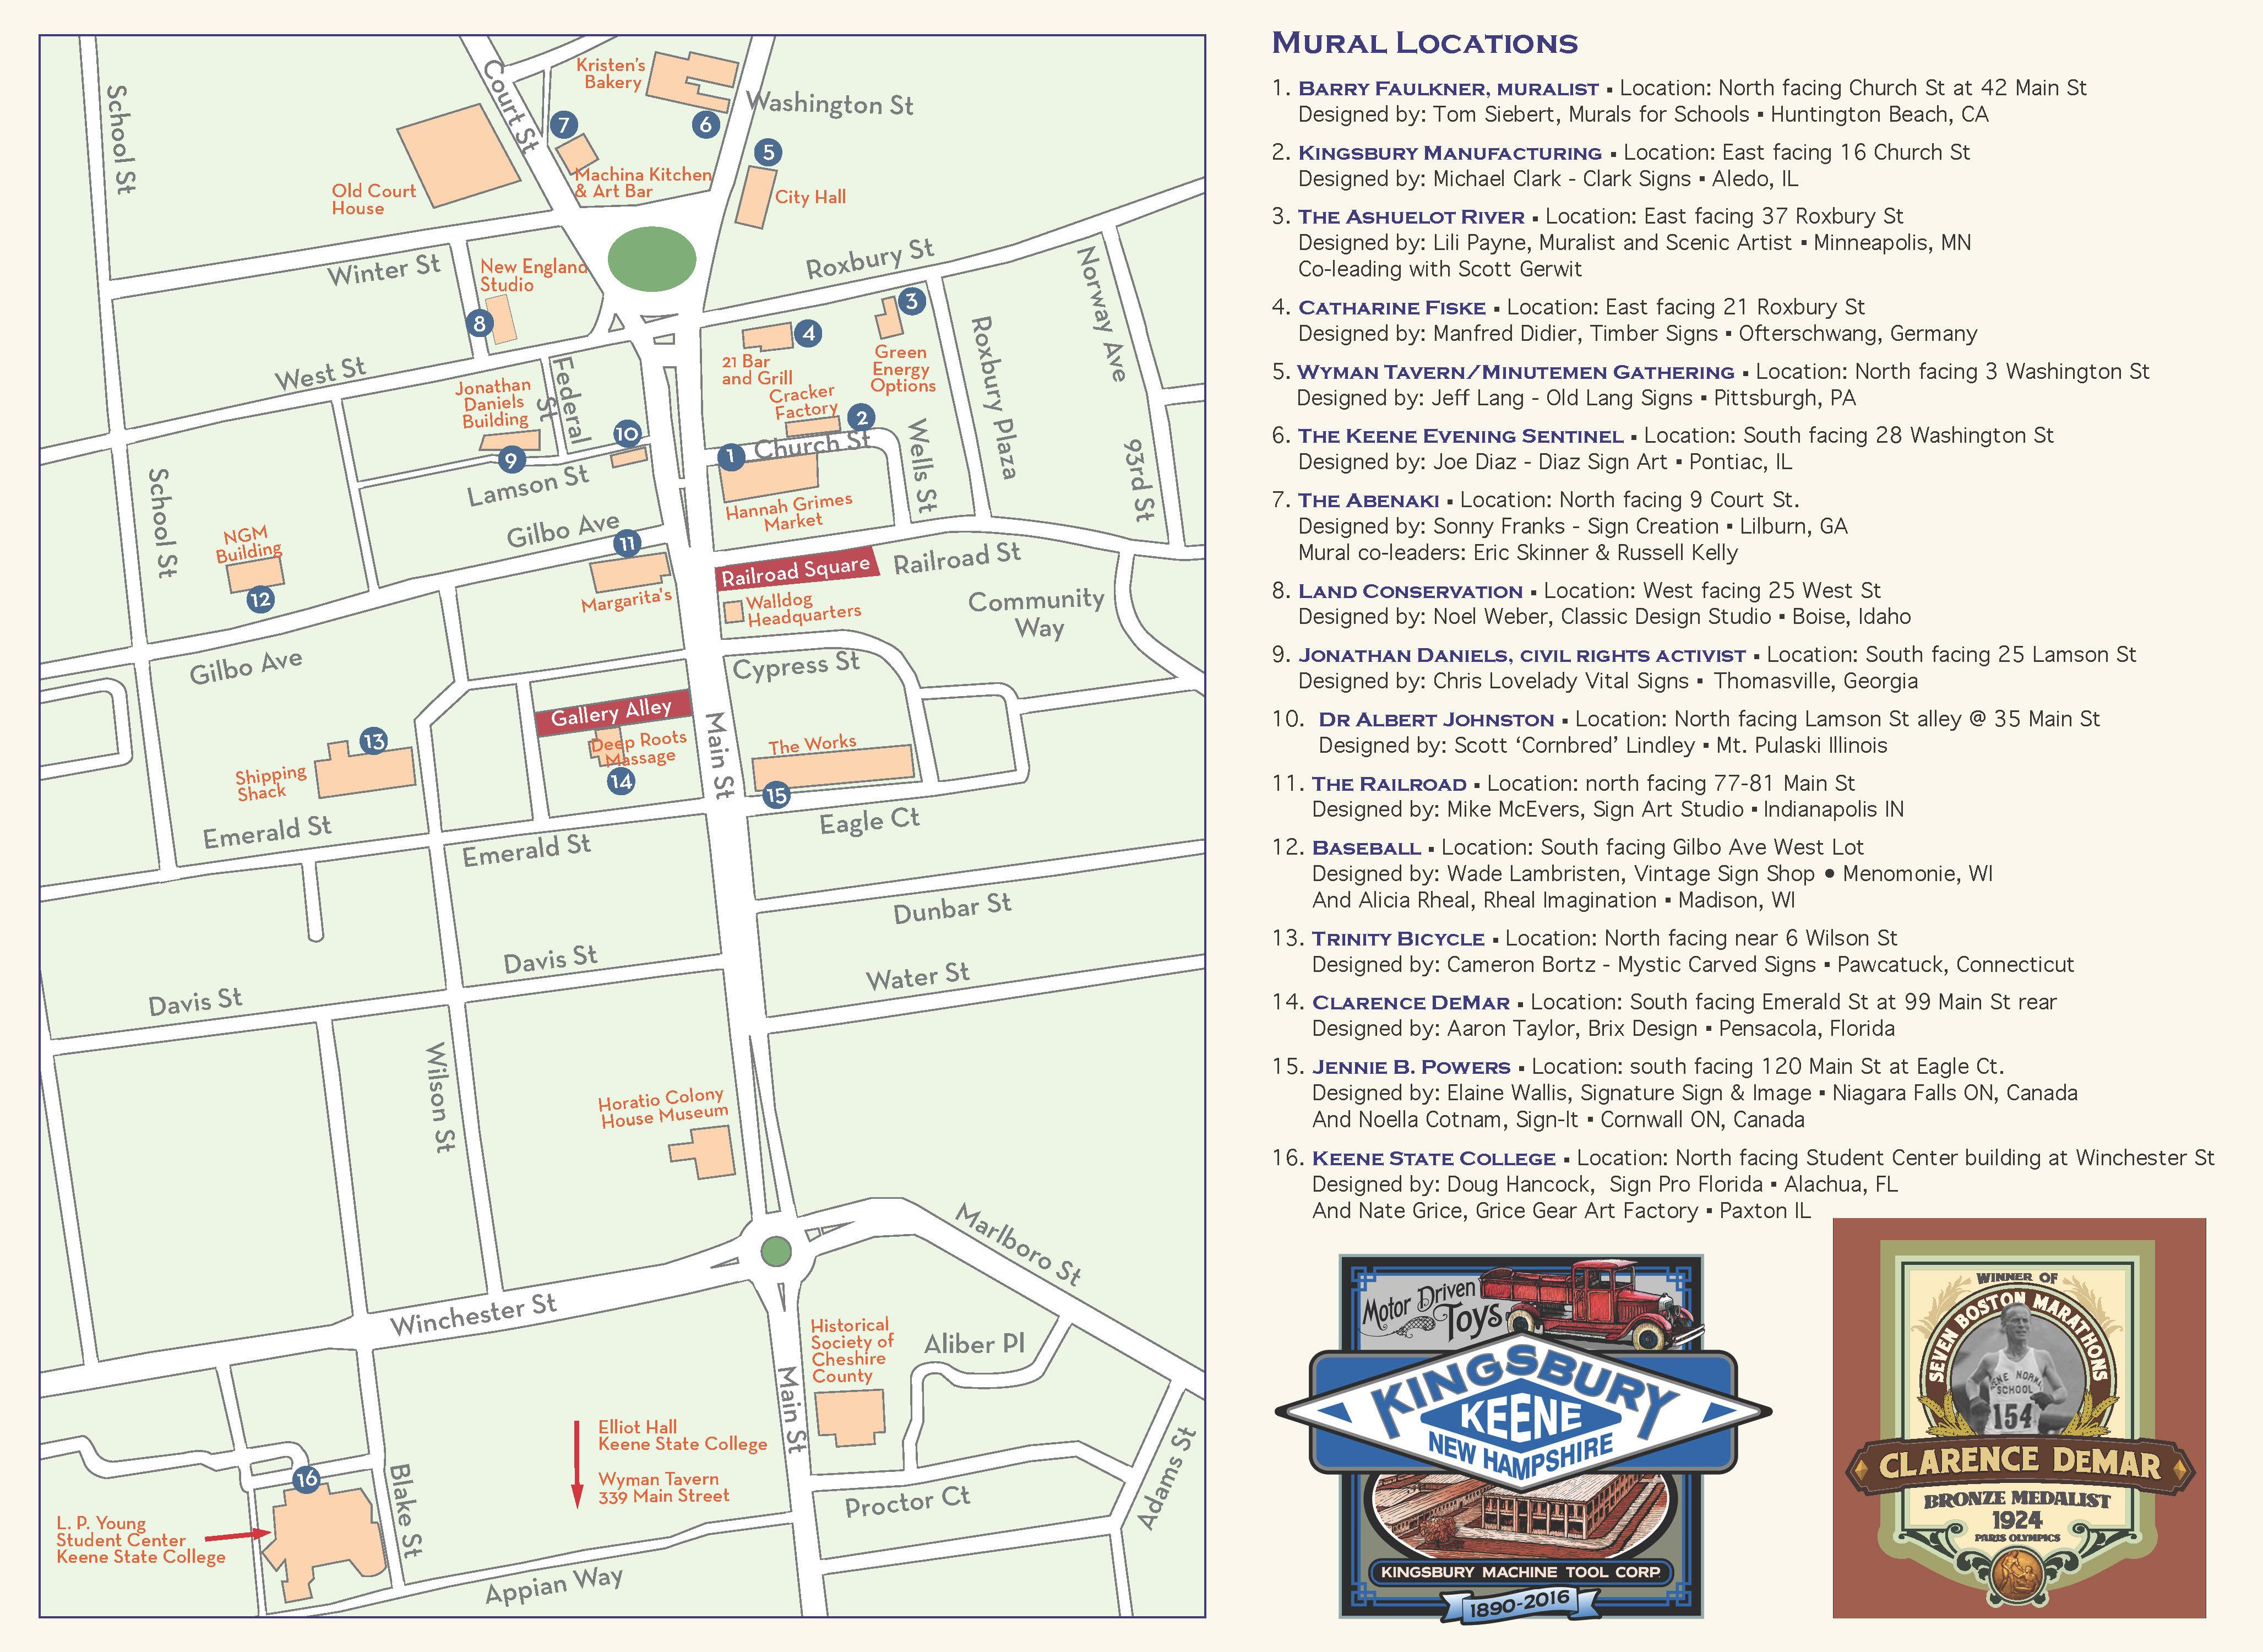 keene new hampshire map Walldog Mural Downtown Map City Of Keene keene new hampshire map